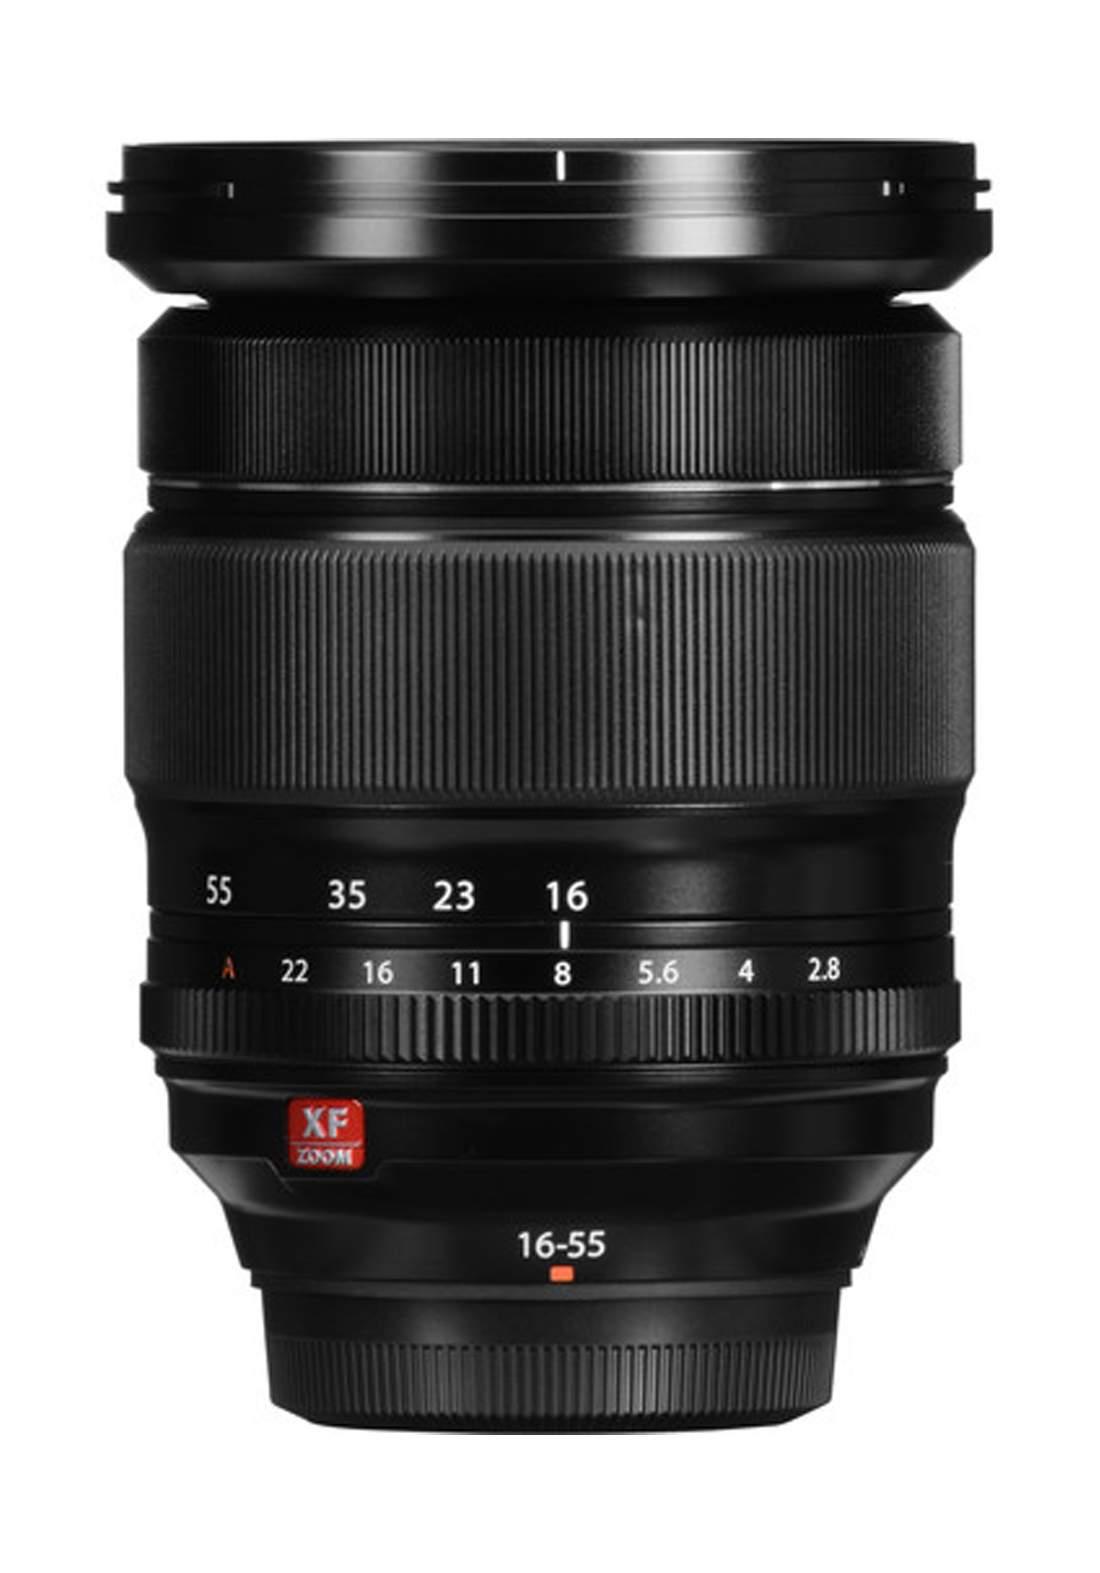 Fujifilm XF 16-55mm F2.8 R LM WR Lens  - Black عدسة كاميرا